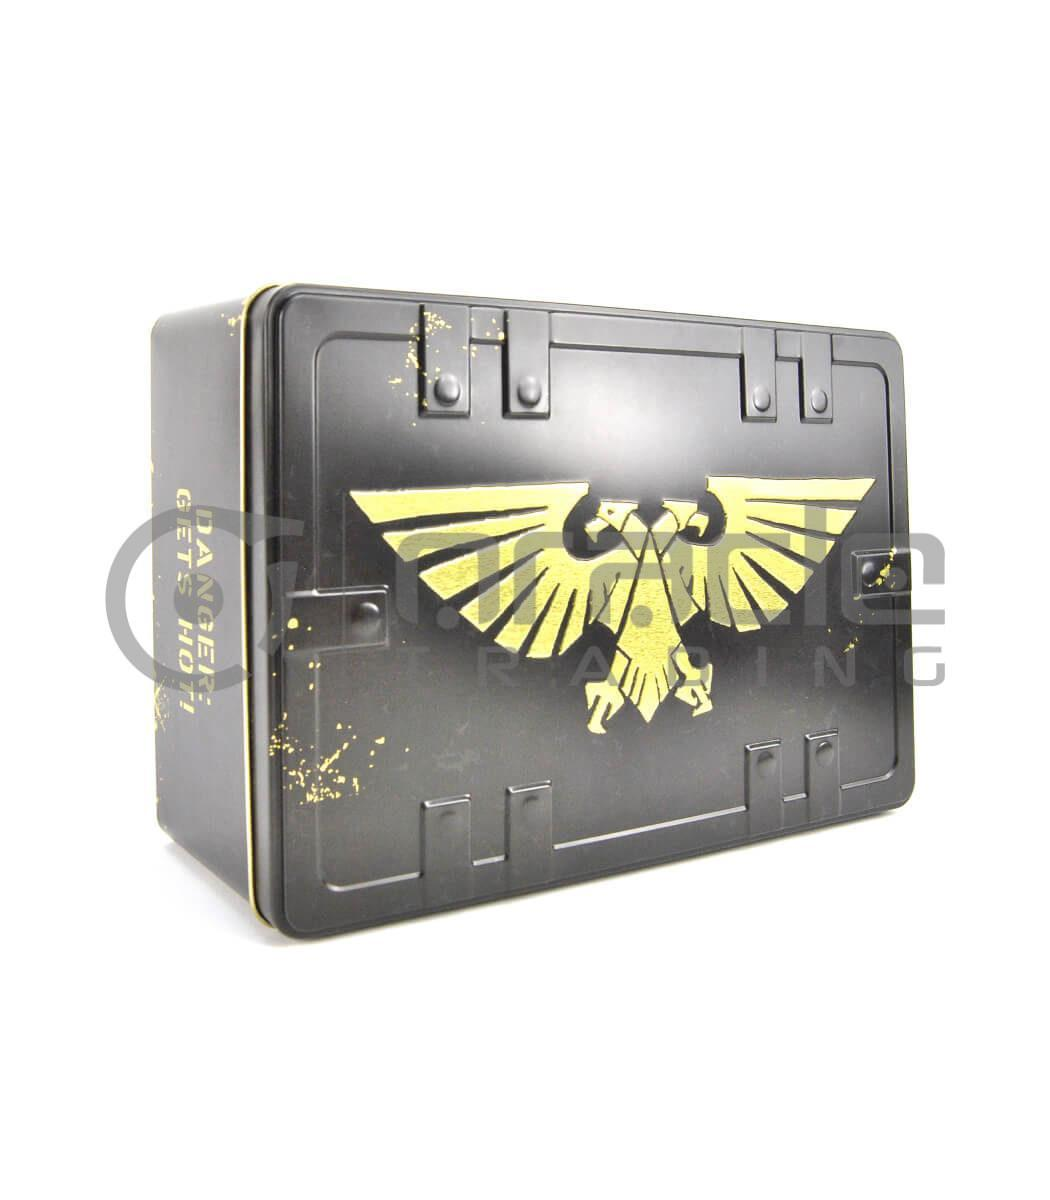 Warhammer Tool Box - 40